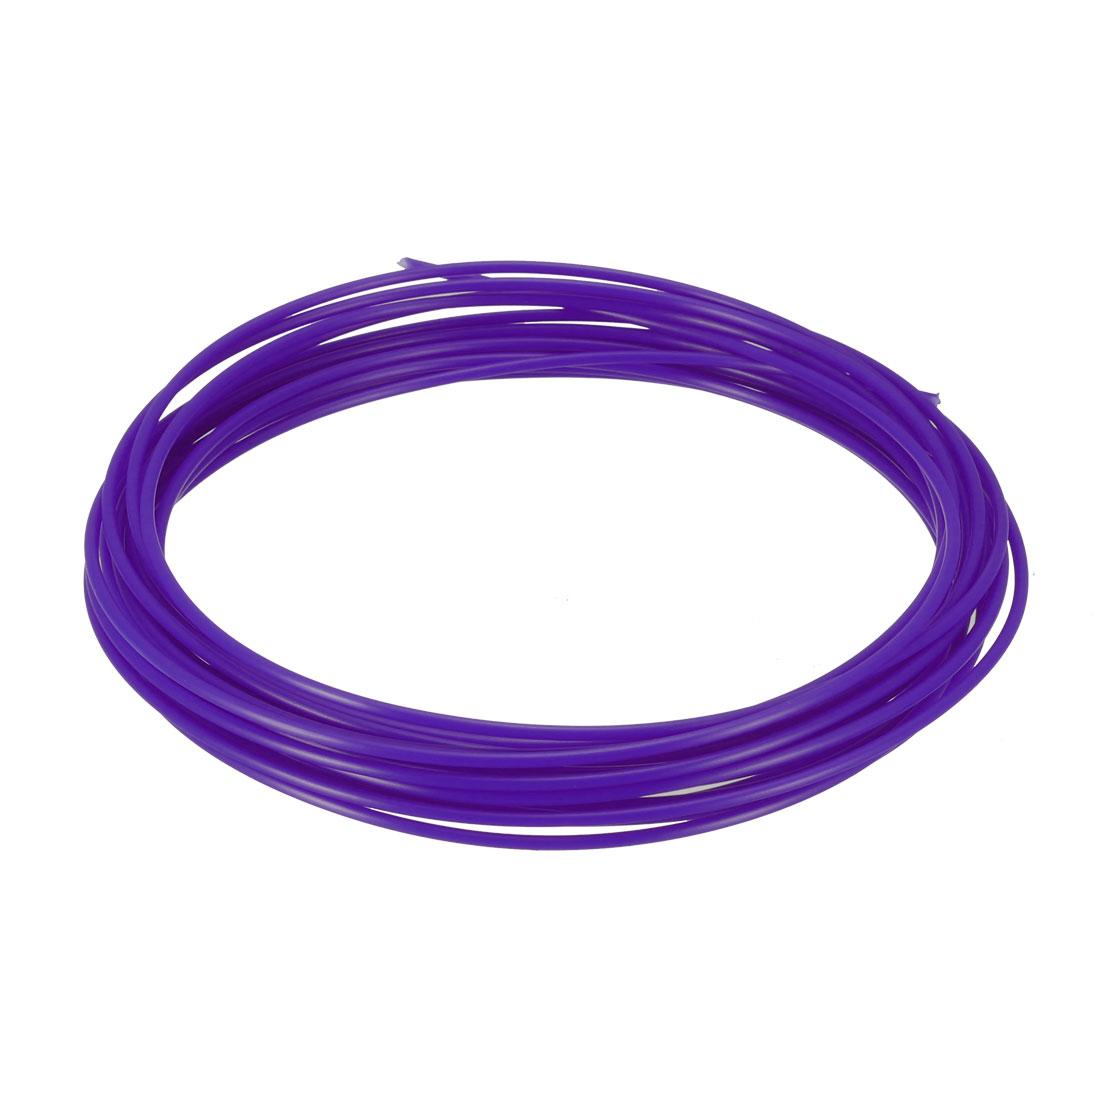 5 Meter/16 Ft ABS 3D Pen/3D Printer Filament, 1.75 mm Purple